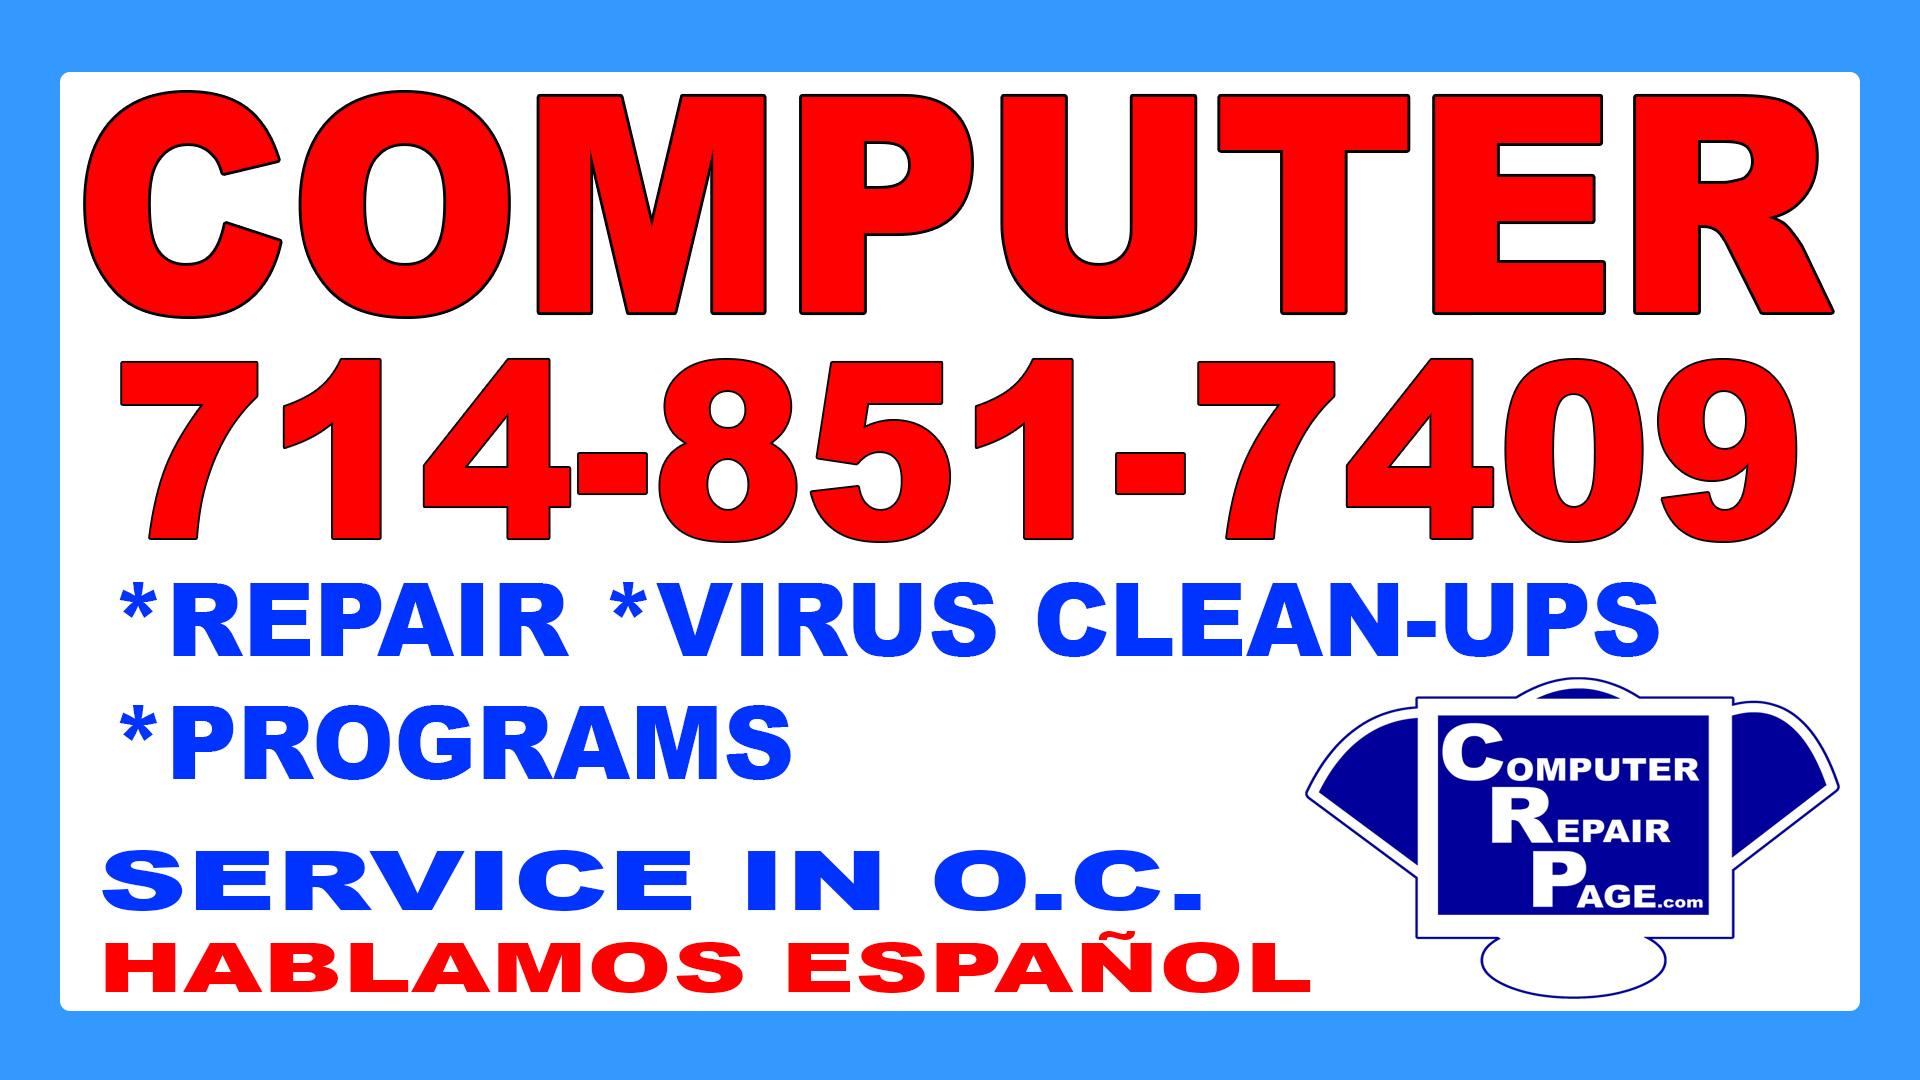 Computer Repair Service in Santa Ana CA, and Orange County